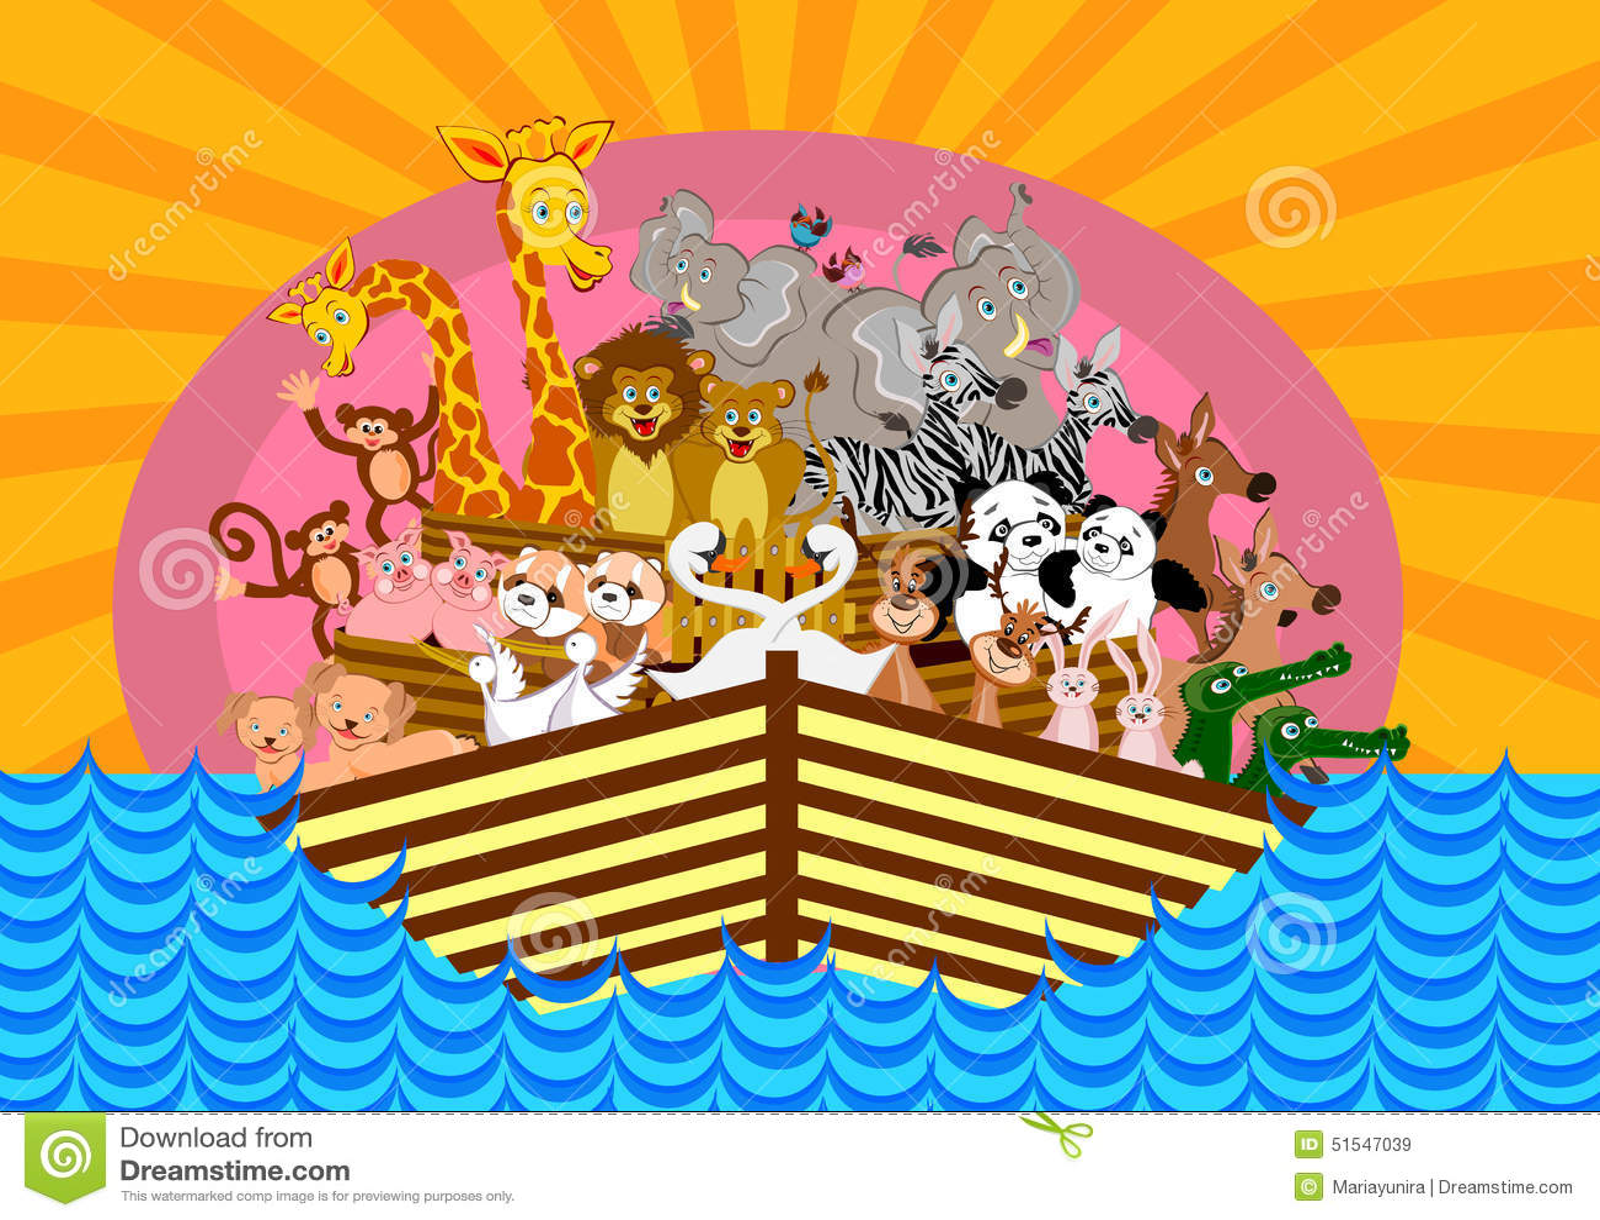 noahs ark stock illustration image 51547039